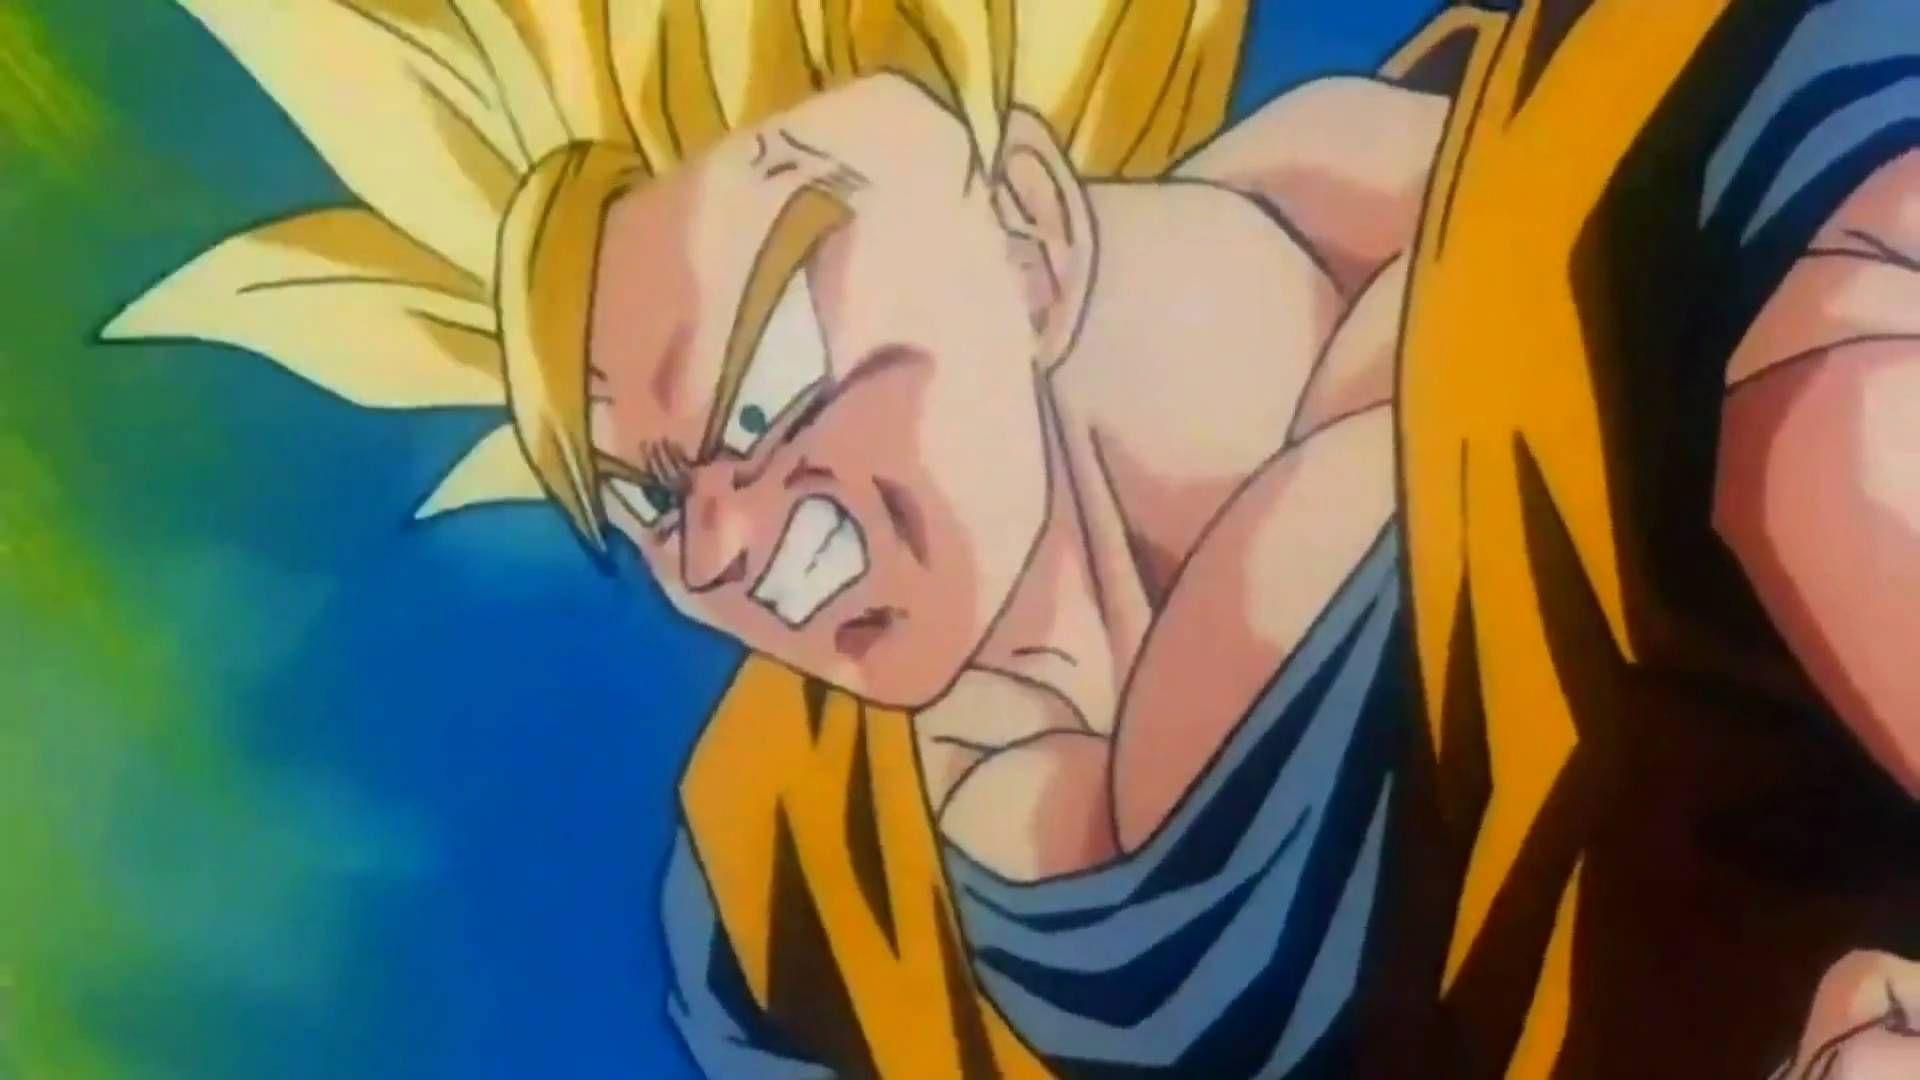 Biggest Screamfest In The Buu Saga Goku Ascends To Super Saiyan 3 Please Do Take Notice That Goku S Power Just To Get To This Goku Dragon Ball Dragon Ball Z